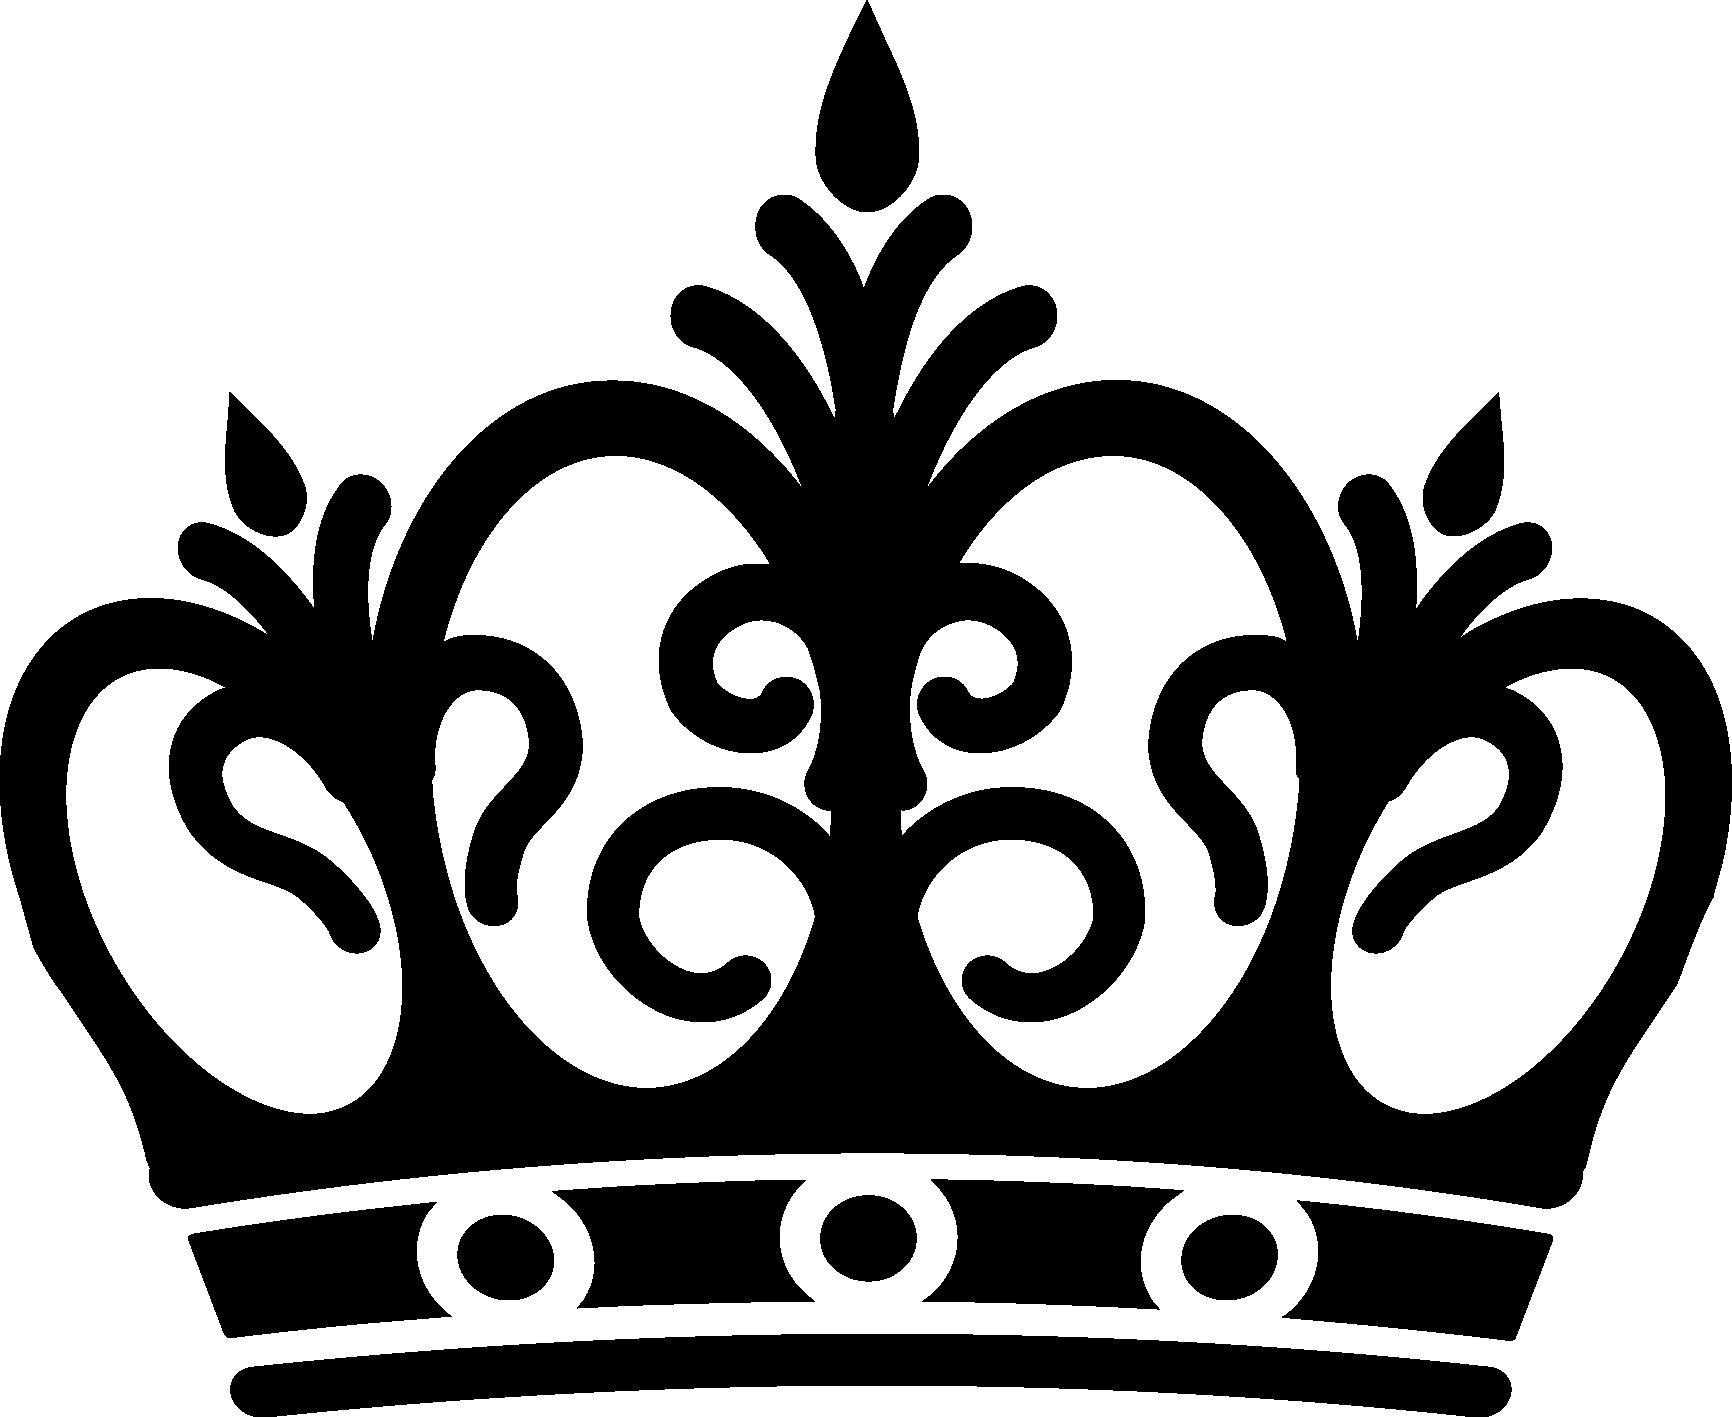 crown drawing images at getdrawings com free for princess crown vector png princess crown vector png